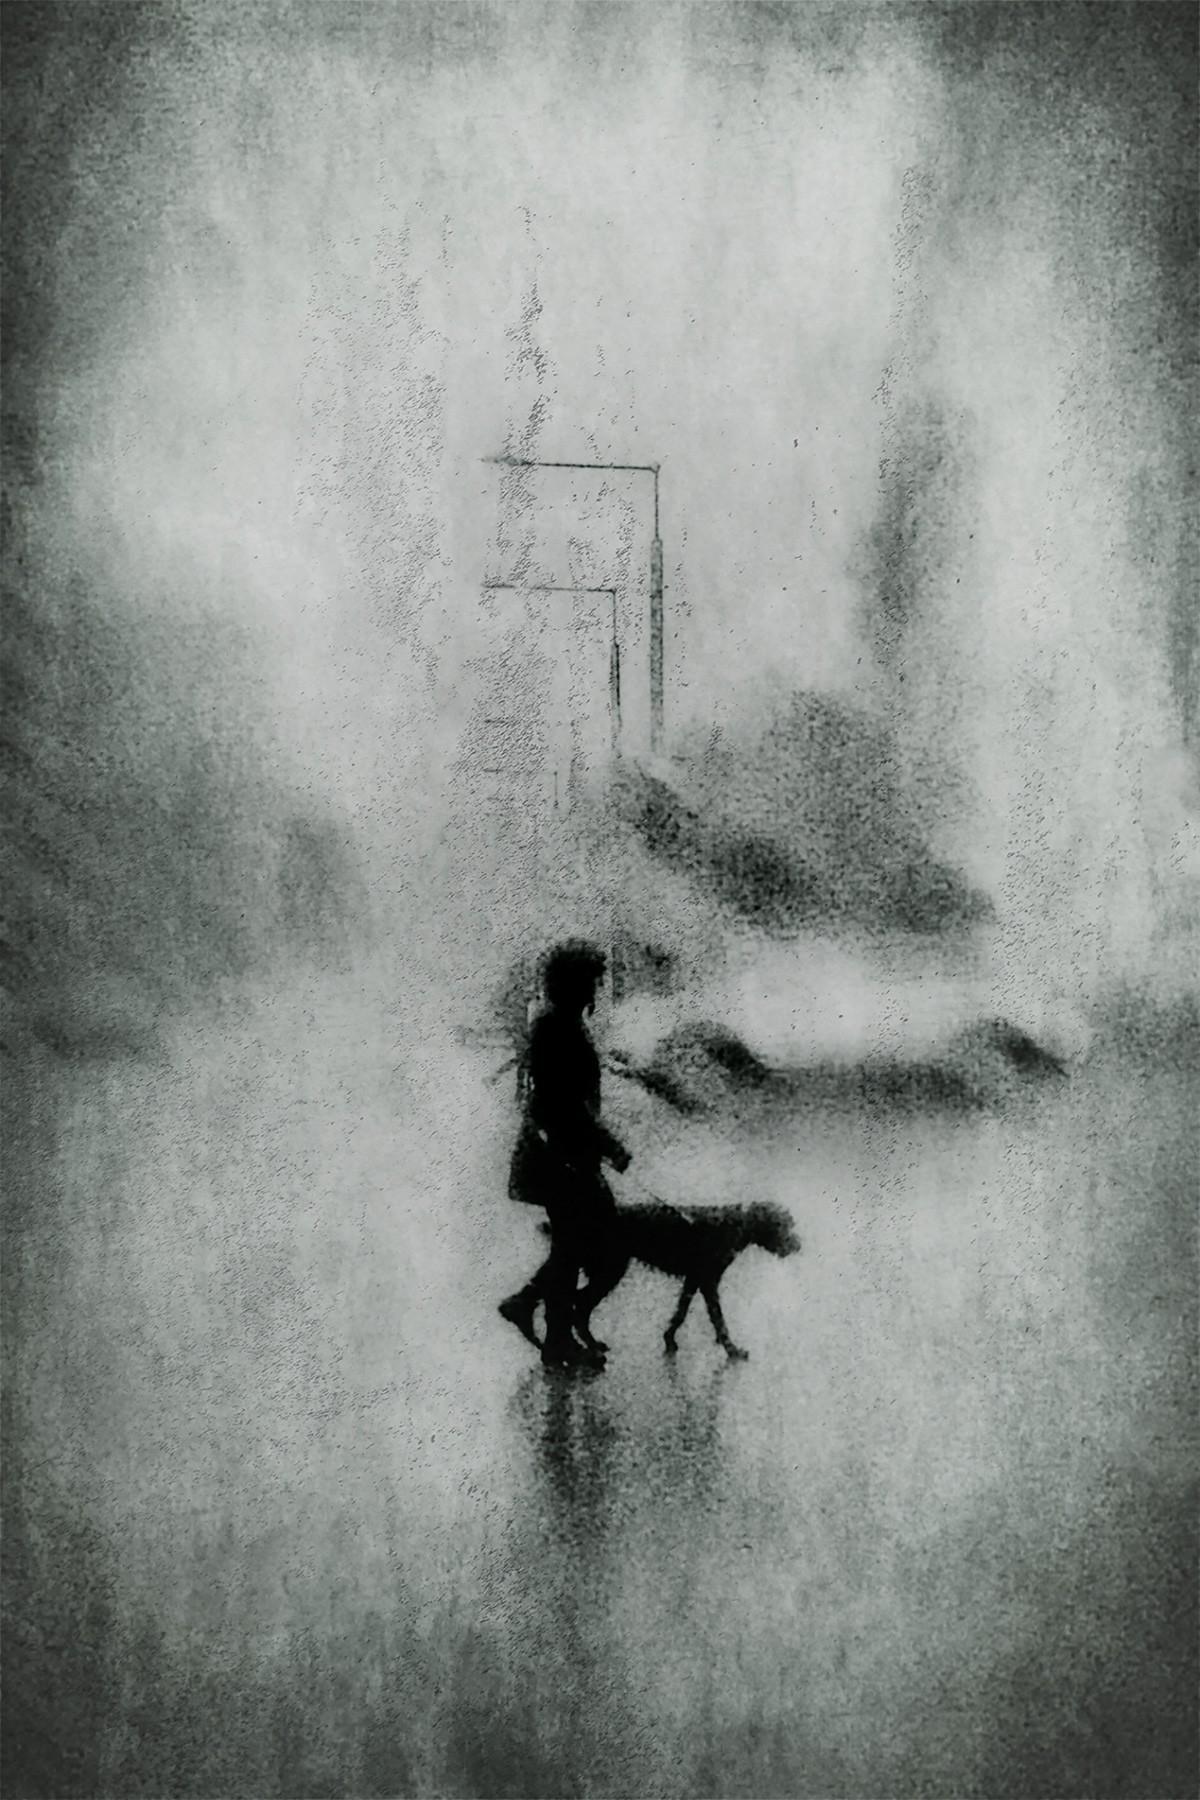 Зимняя дымка. Автор Даниэль Кастонгуэй